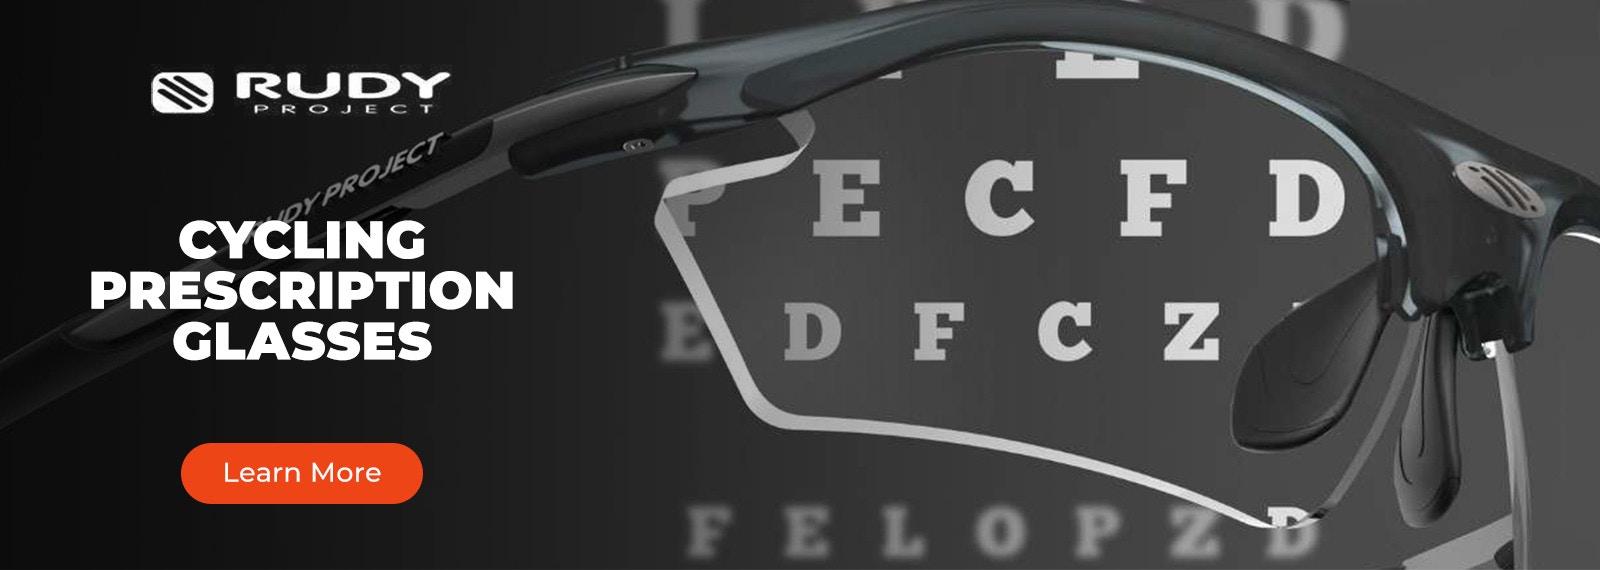 Rudy Project Prescription Cycling Glasses